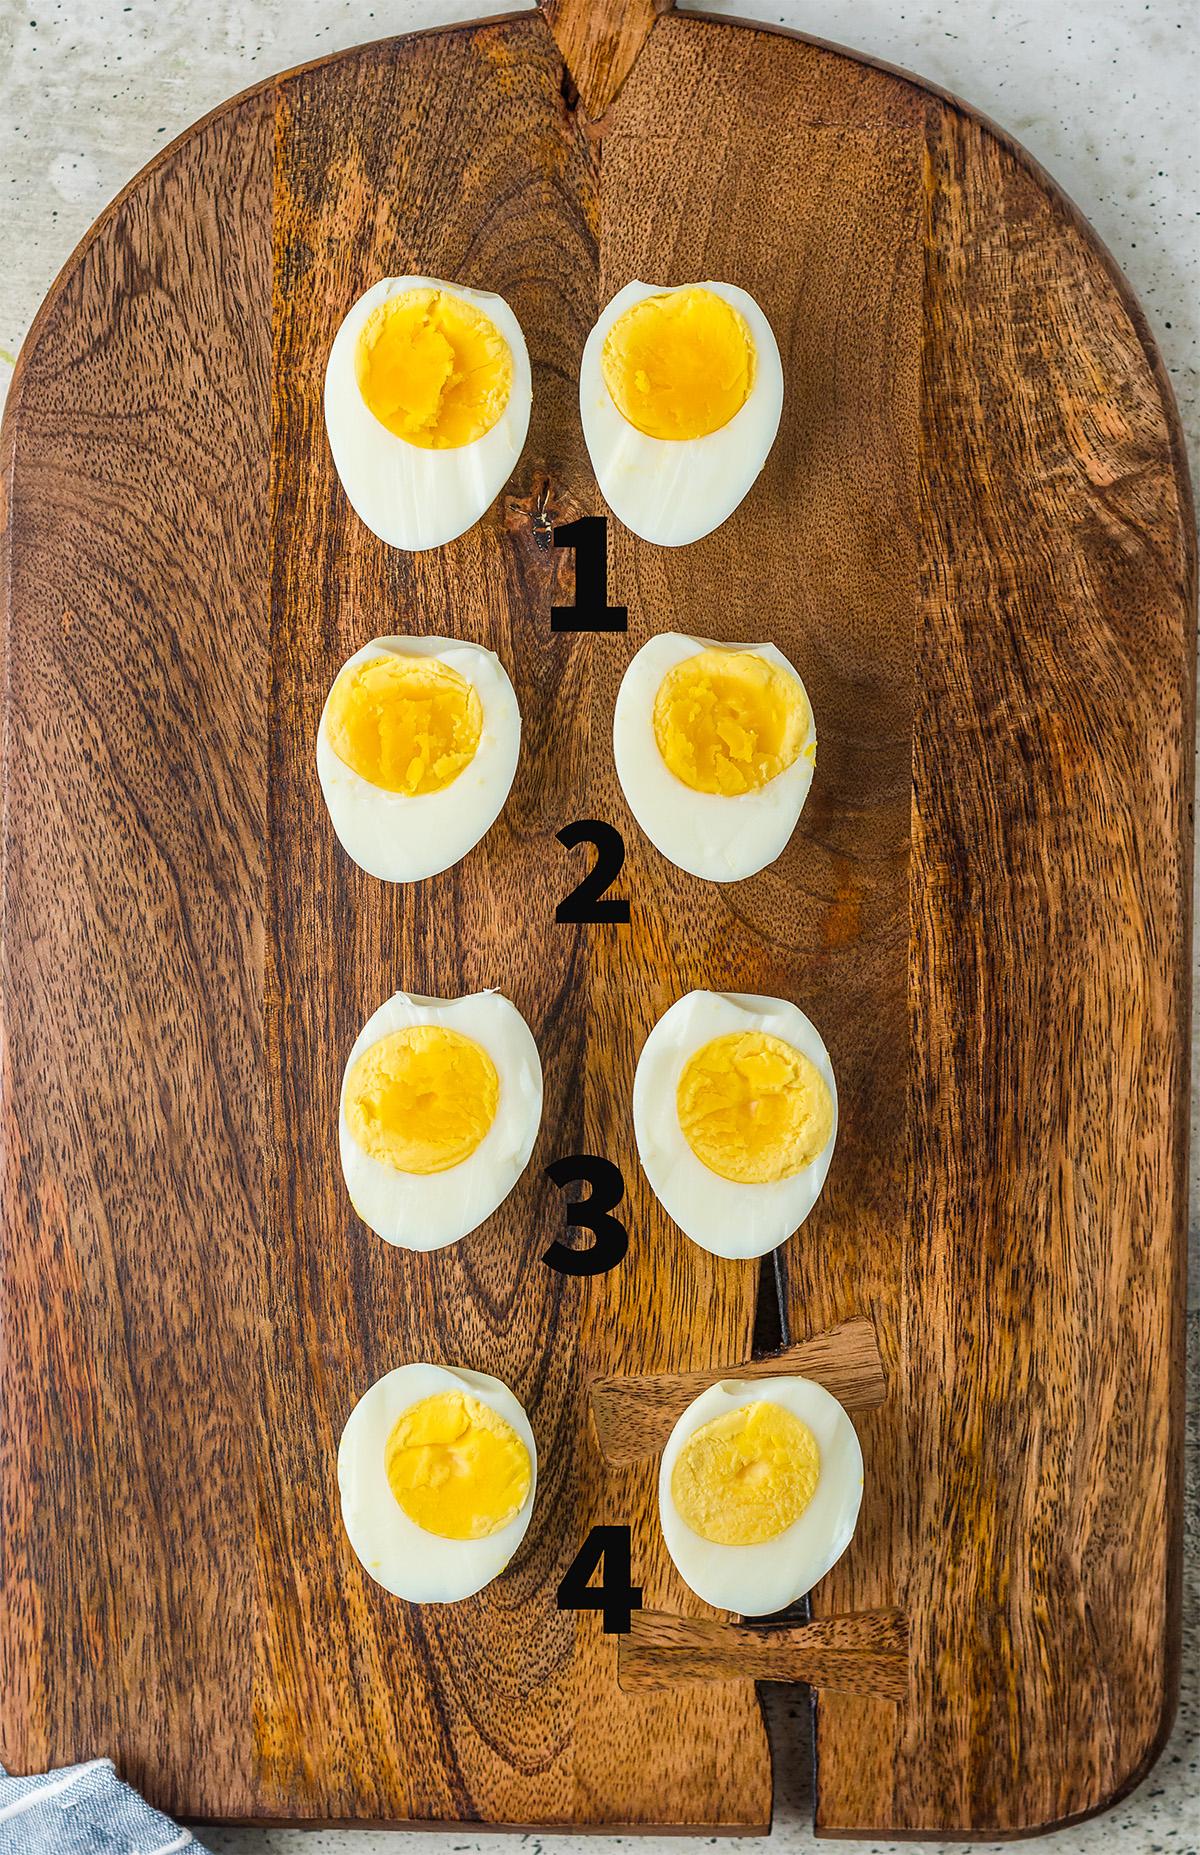 Four eggs cut in half on a wooden cutting board